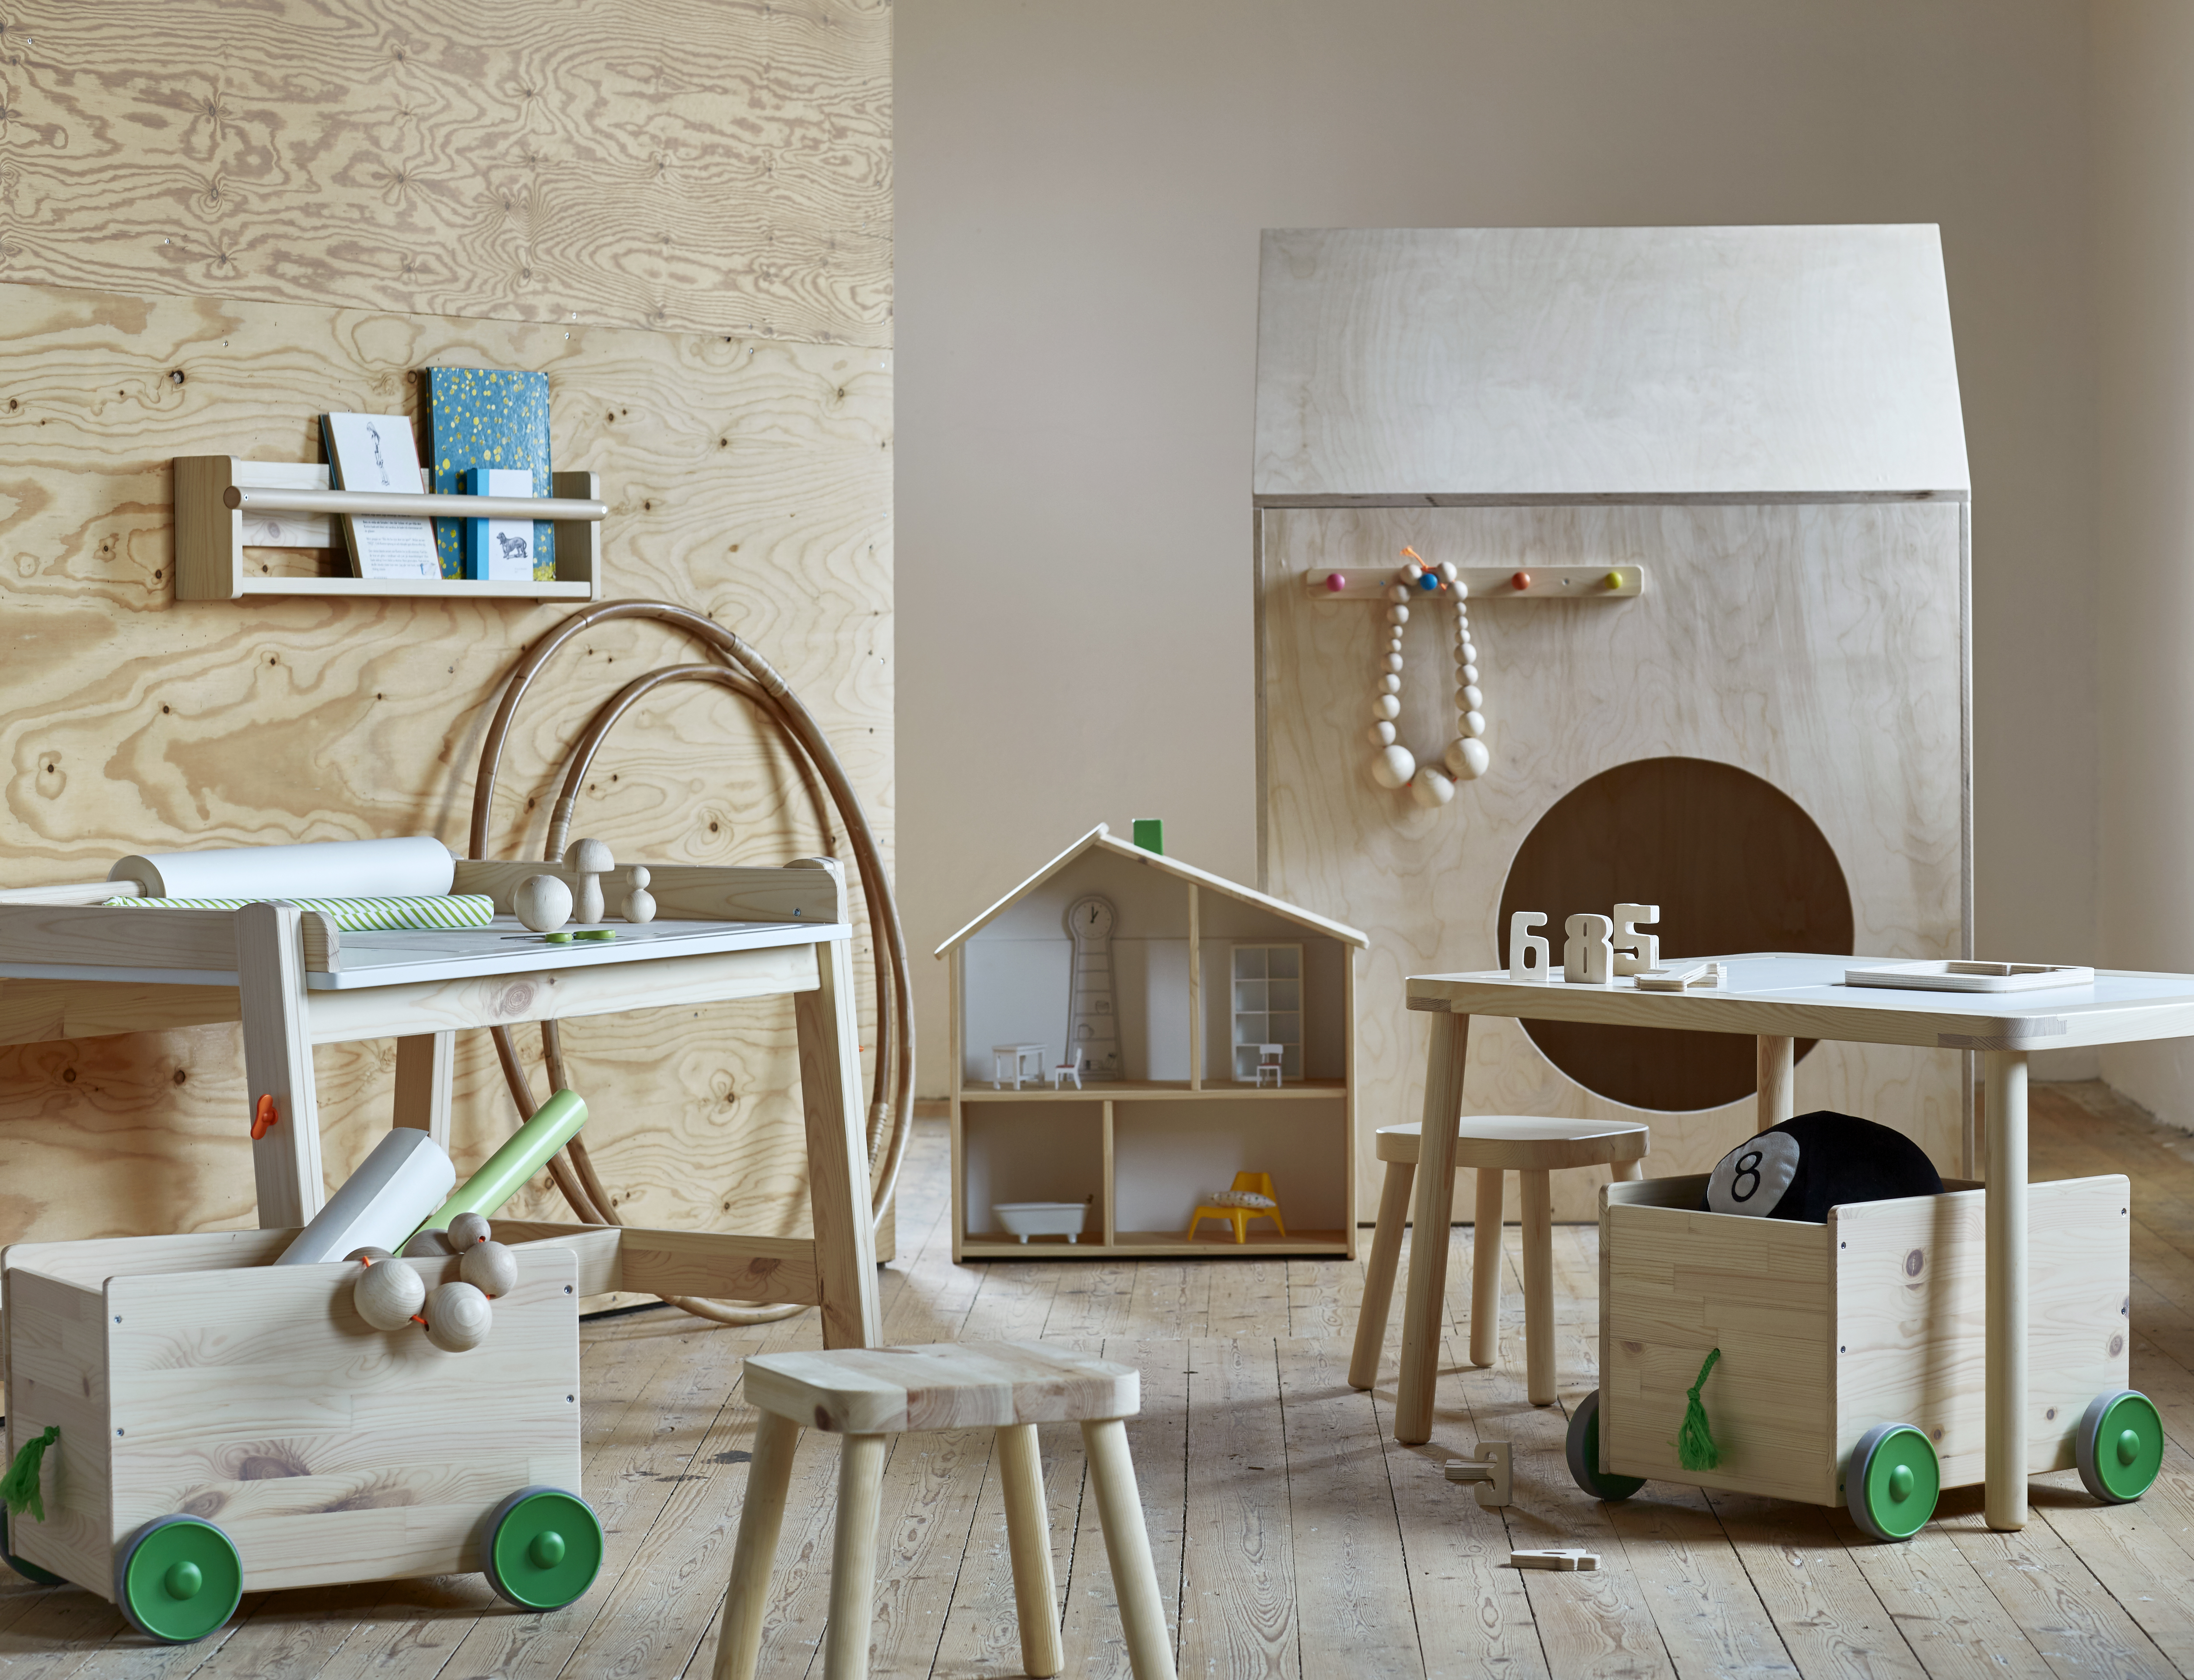 Cameretta Montessoriana Ikea : Giochi montessori ikea